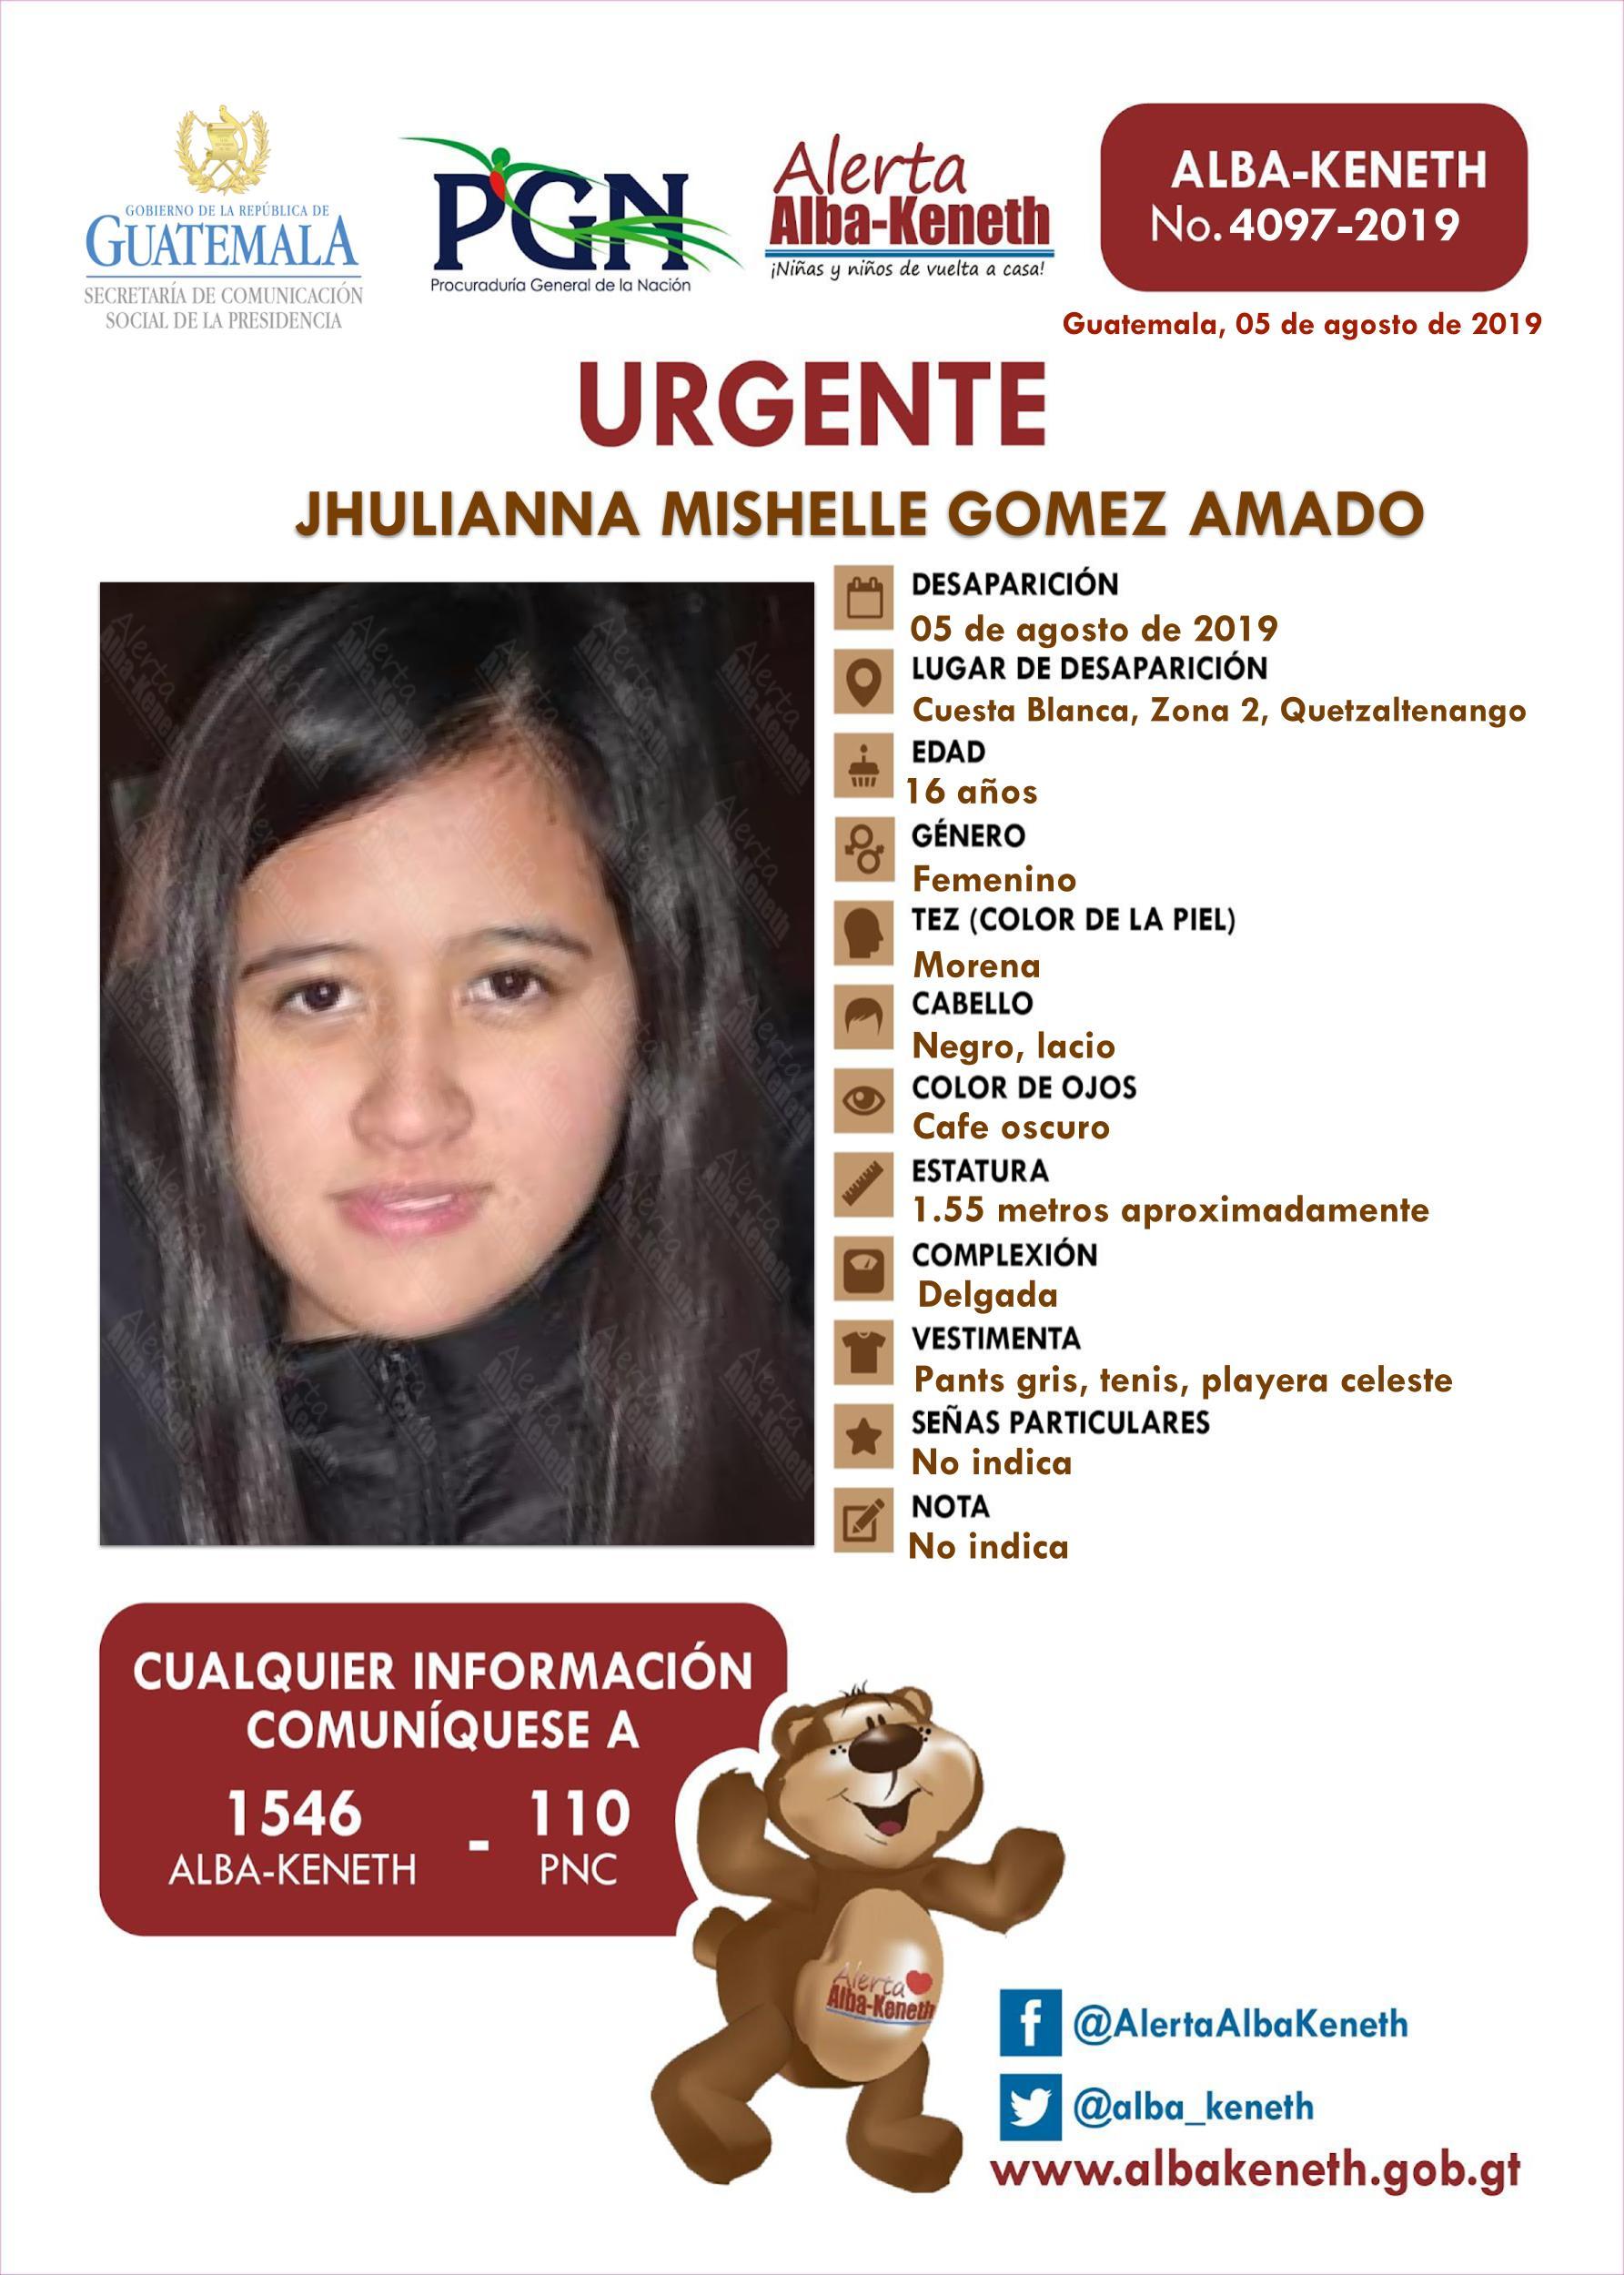 Jhulianna Mishelle Gomez Amado